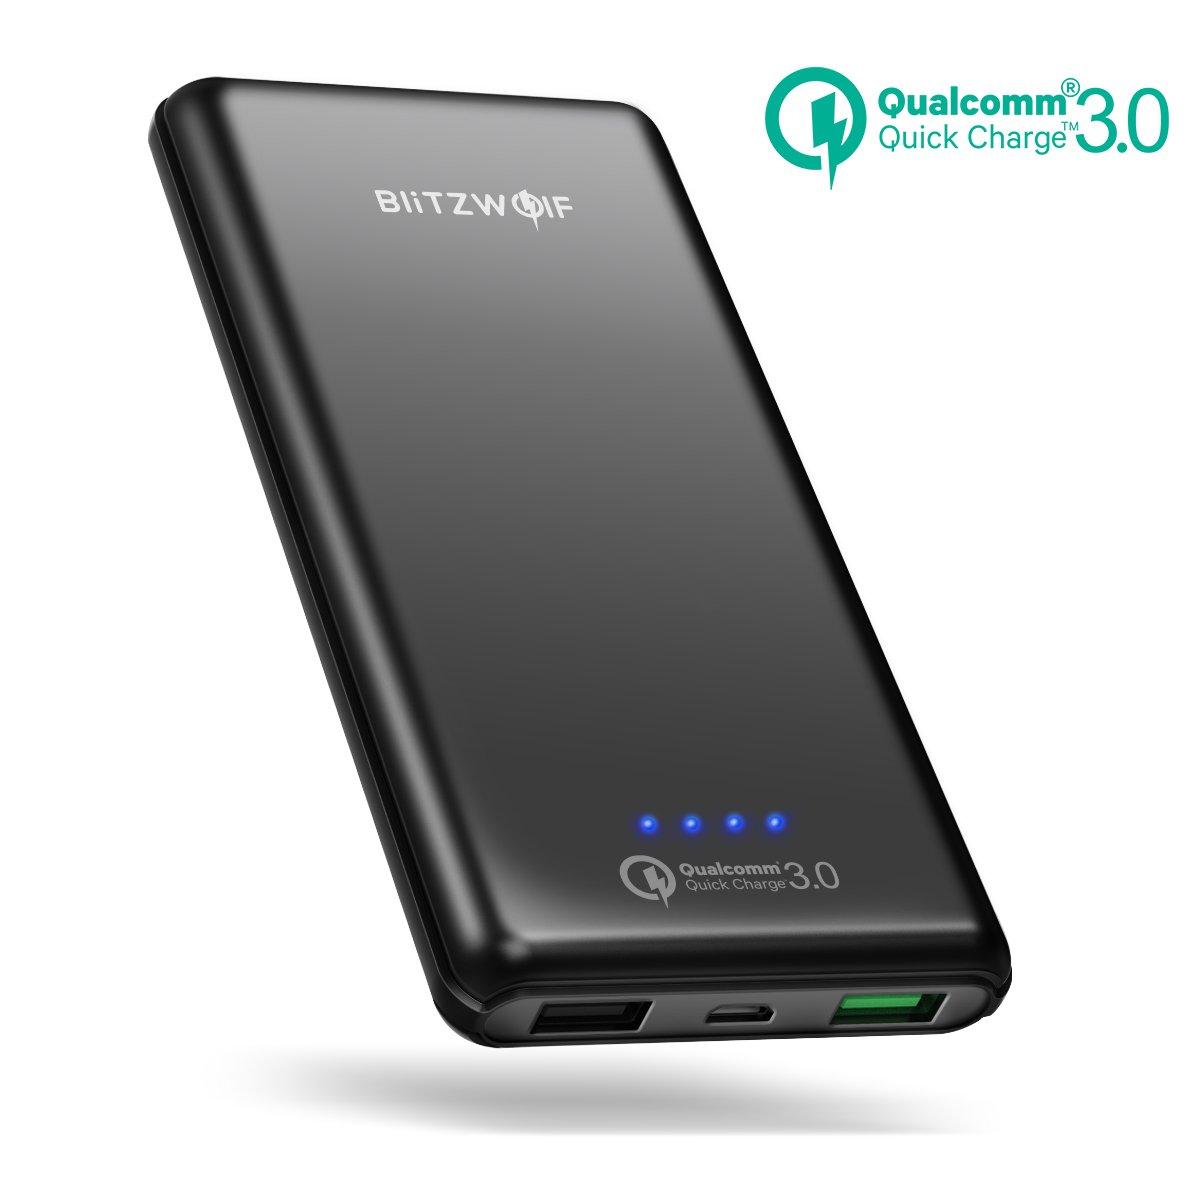 [Quick Charge 3.0] Batería Externa 10000mAh, BlitzWolf Cargador Portátil Qualcomm Carga Rapida 3.0 2 Puertos Power Bank para iPhone, Samsung Android ...